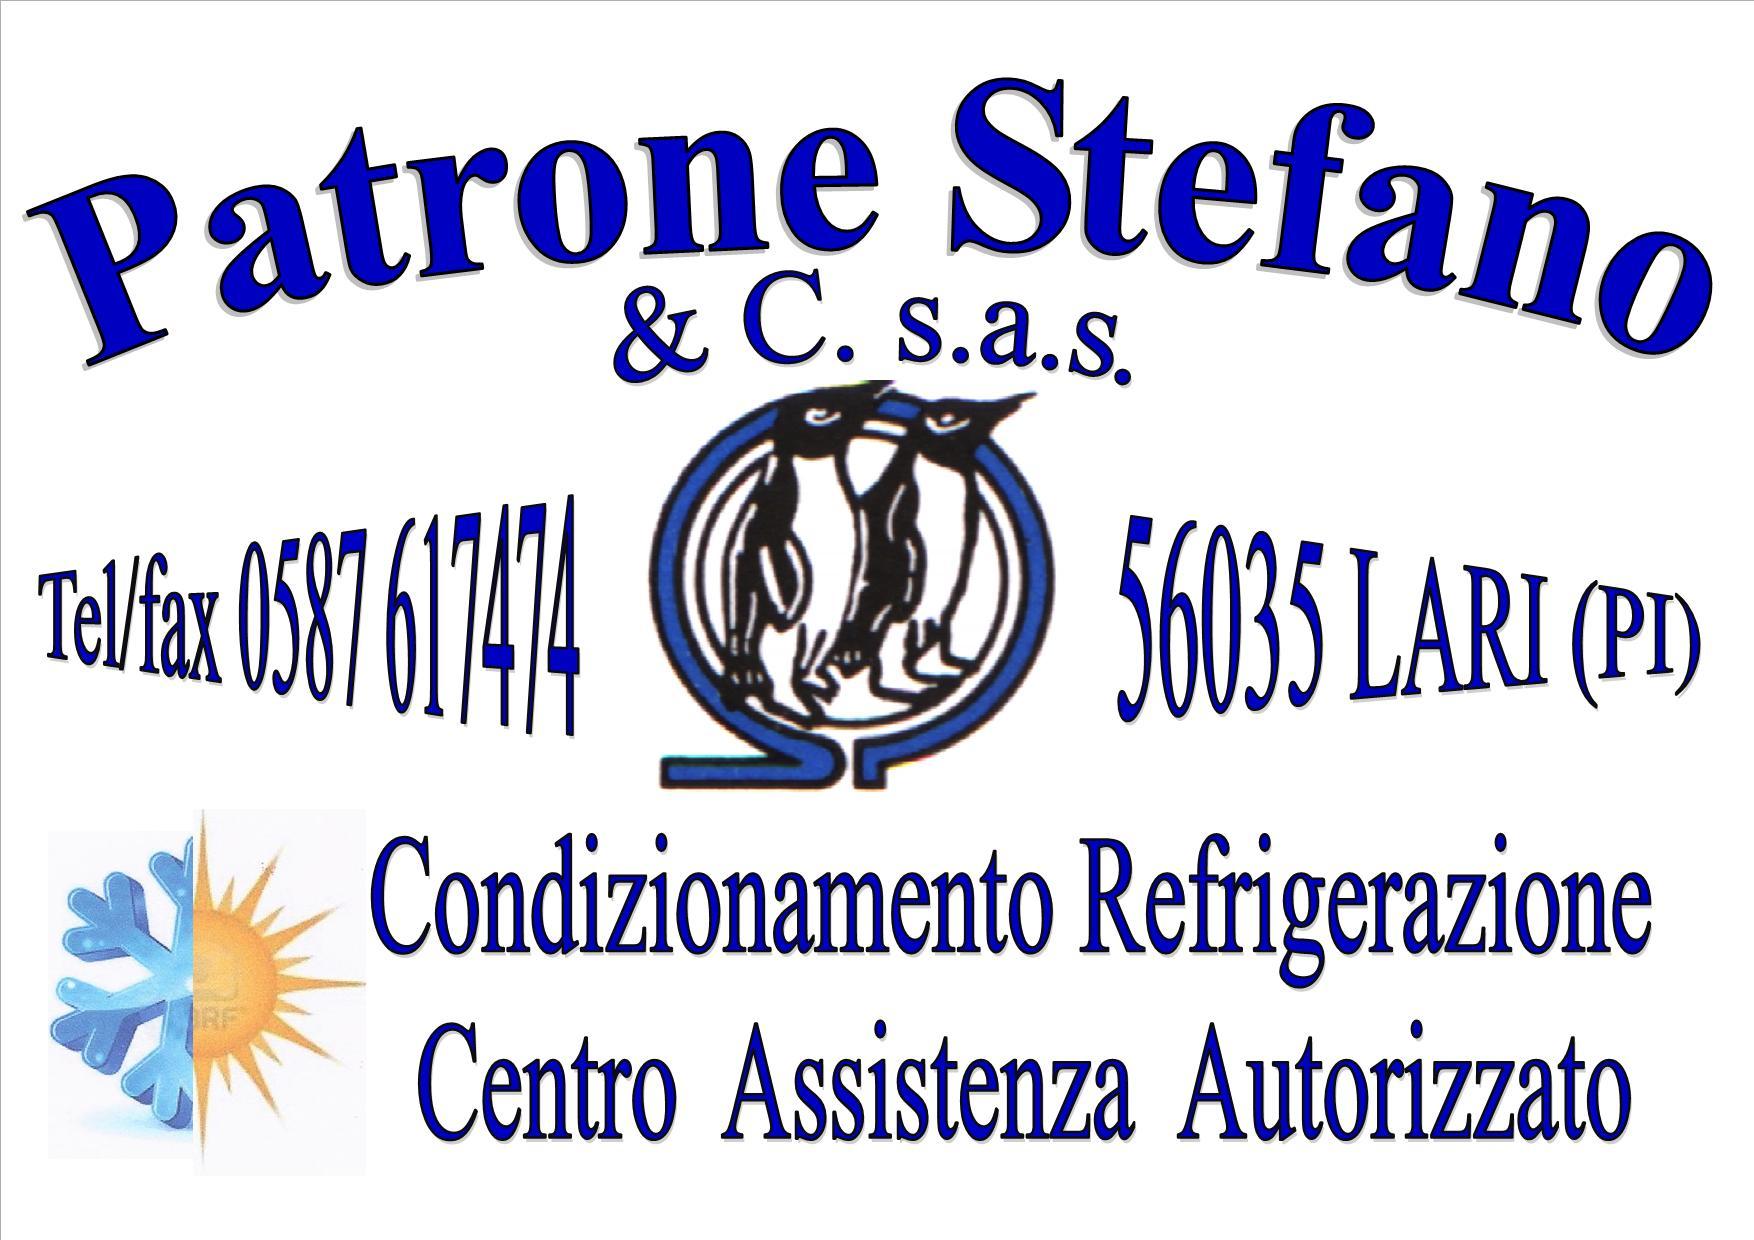 Patrone Stefano & C.